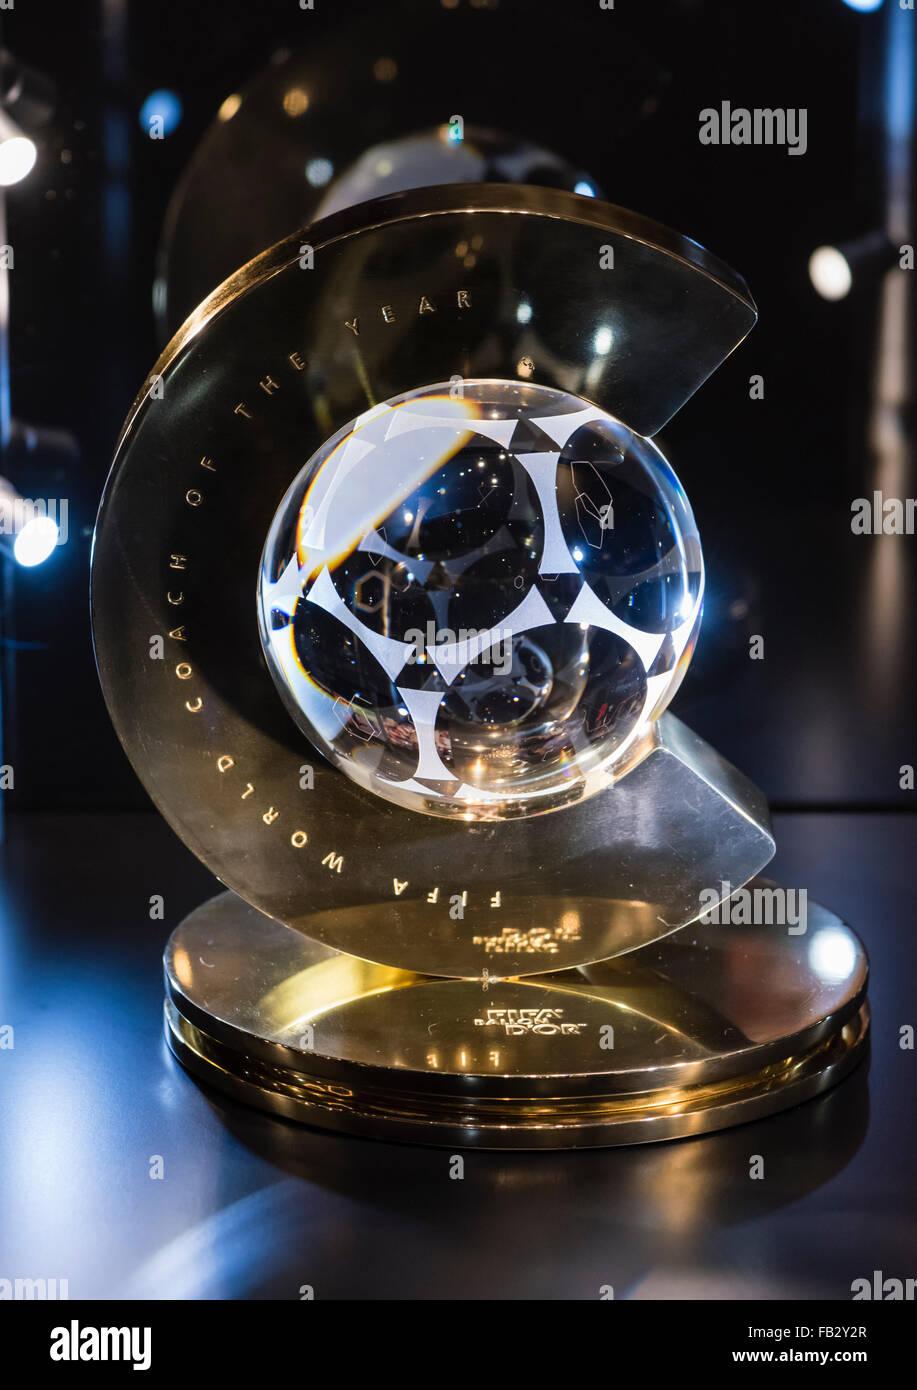 fifa world coach of the year award trophy stock photo 92878207